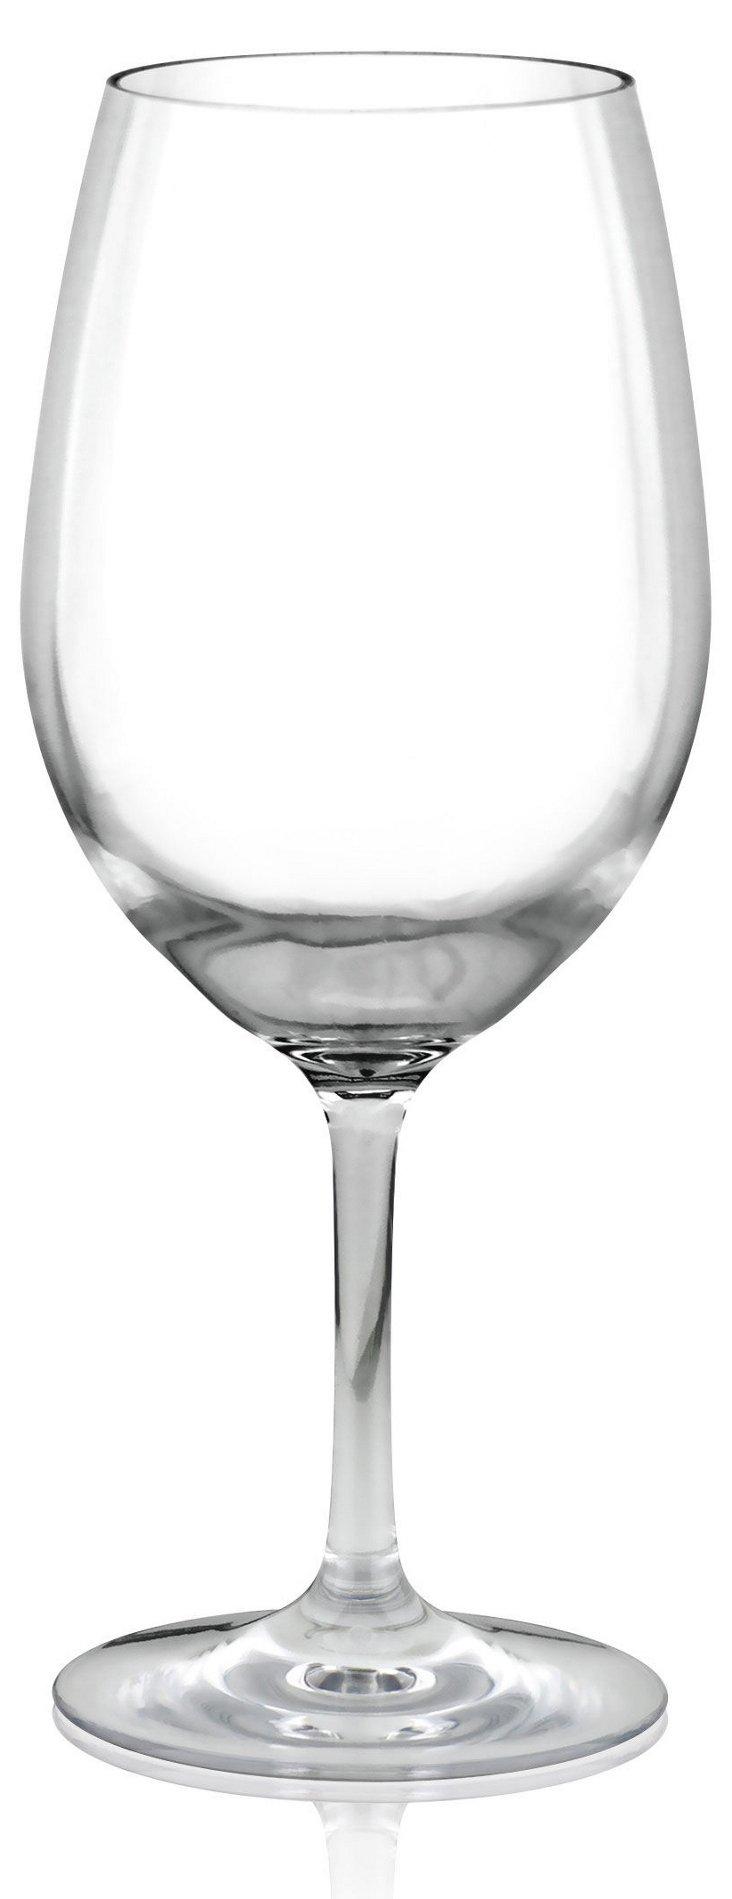 S/4 Unbreakable Wineglasses